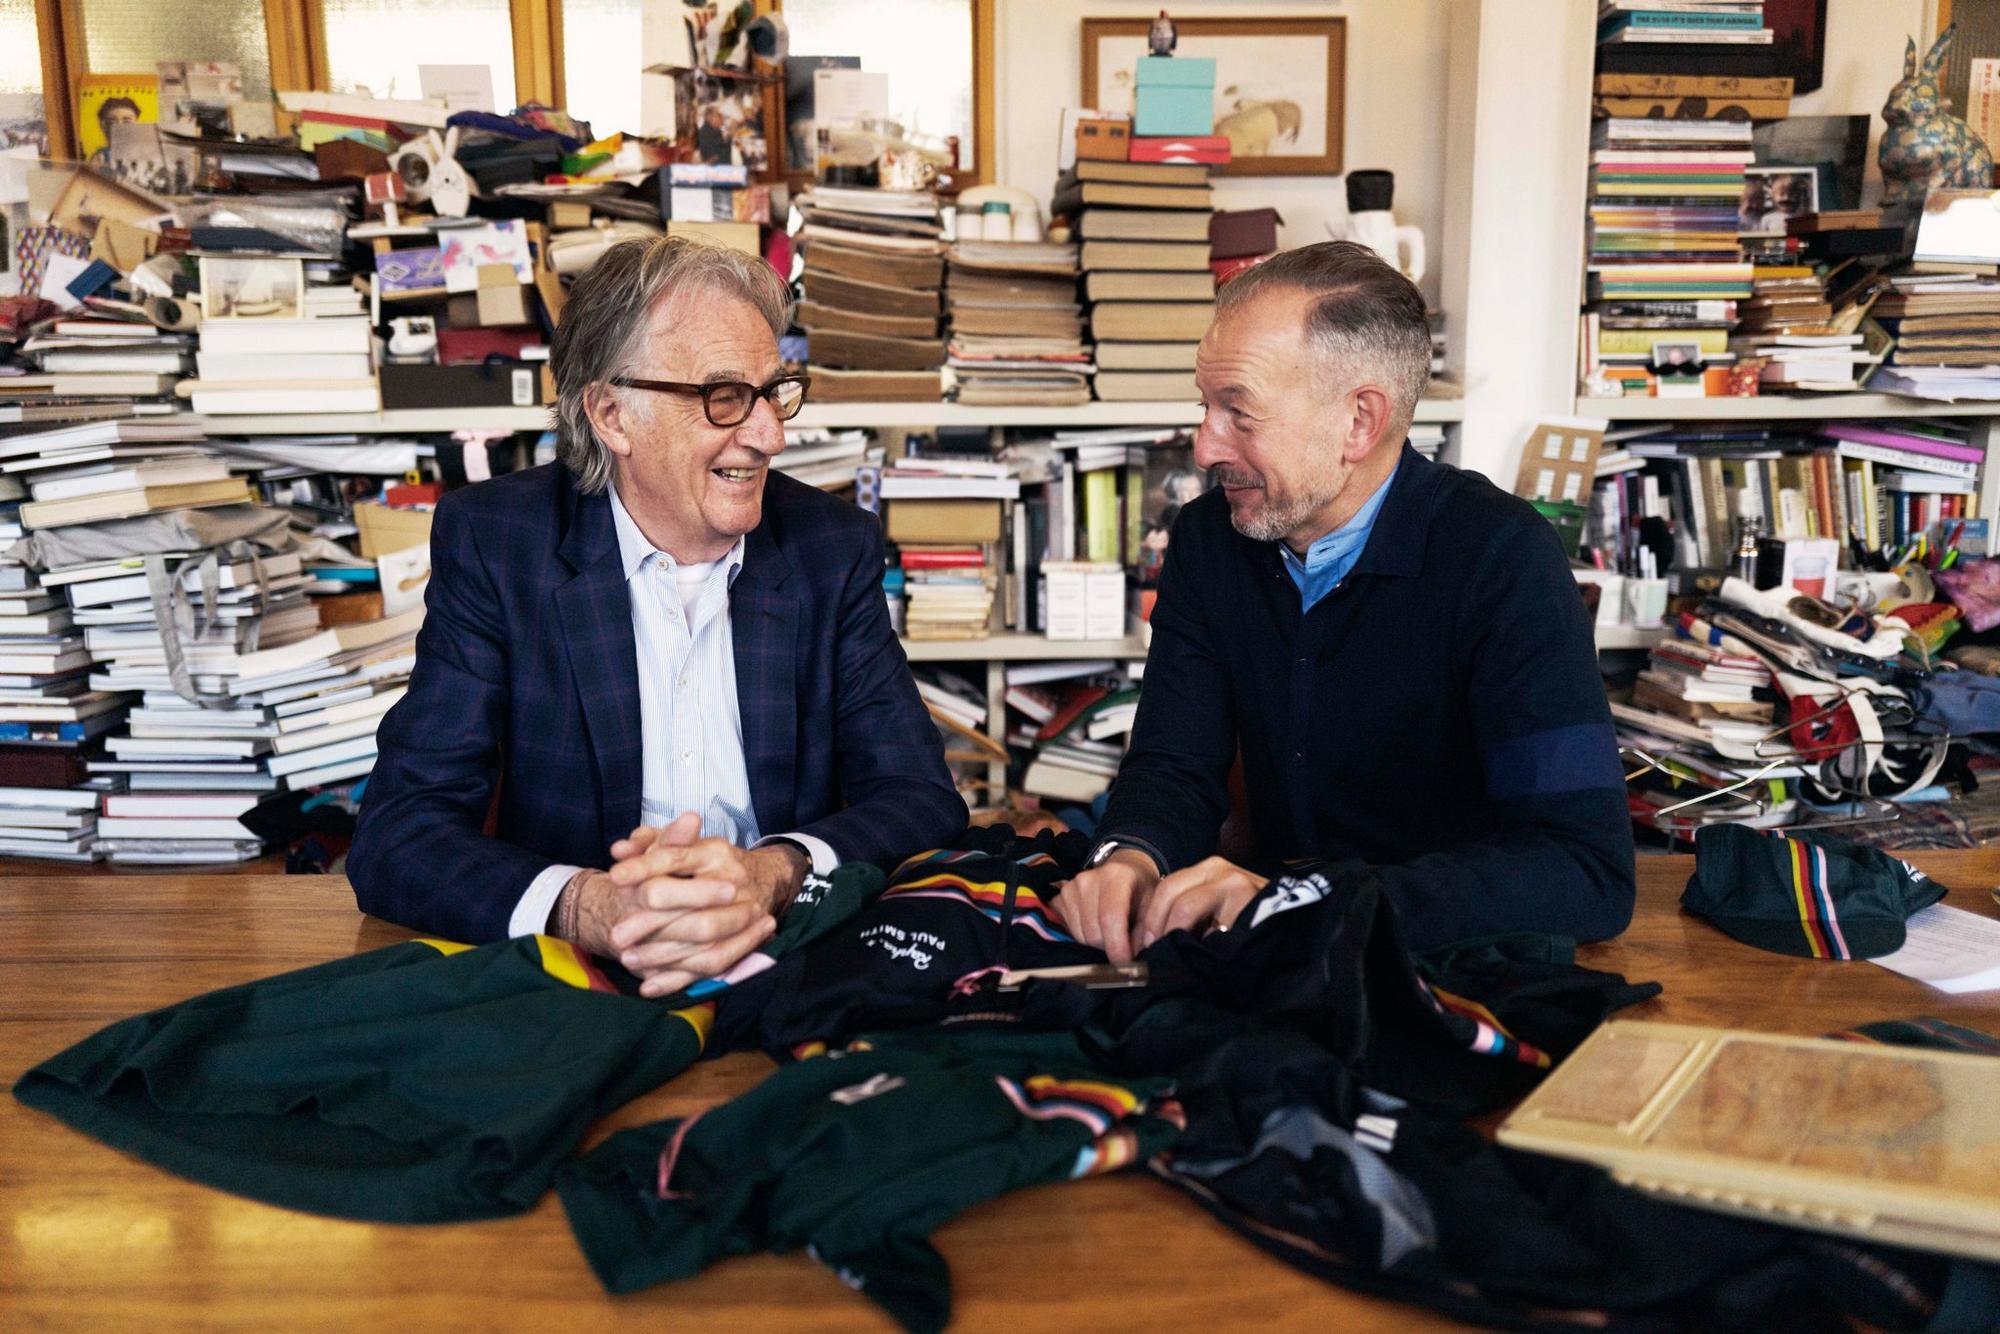 Sir Paul Smith and Simon Mottram